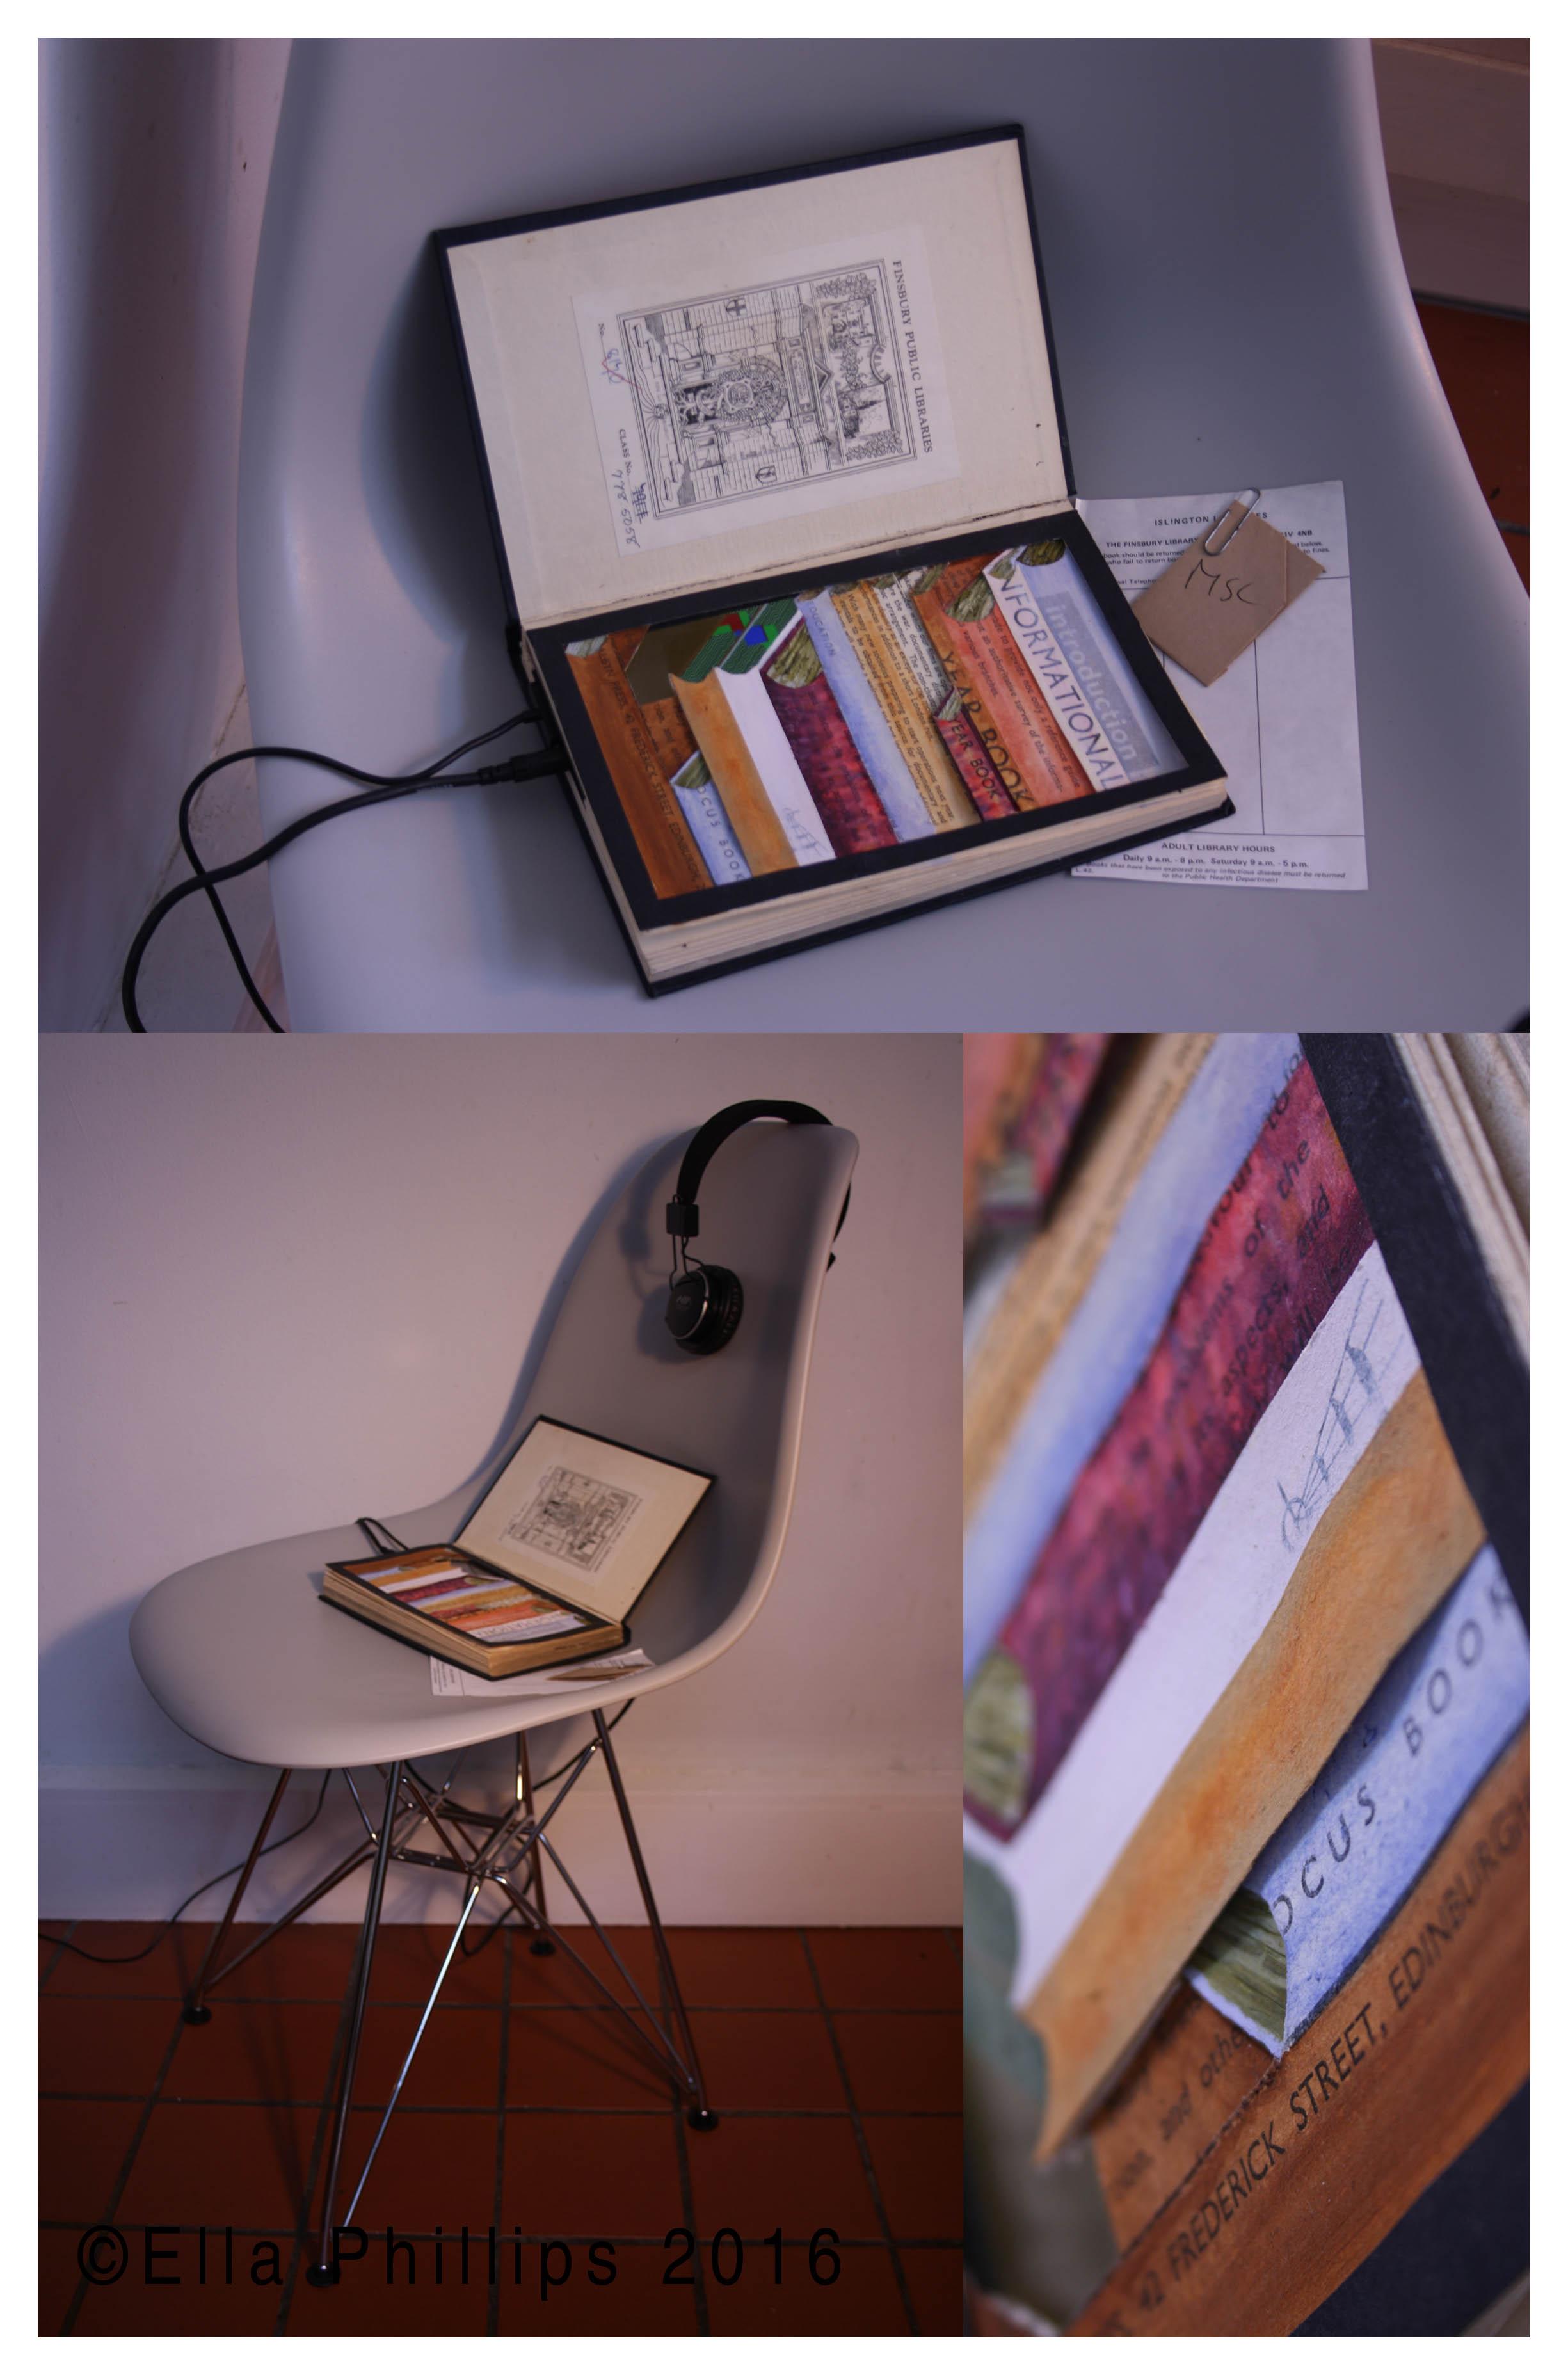 Ella Phillips_While Reading, video installation, 2016